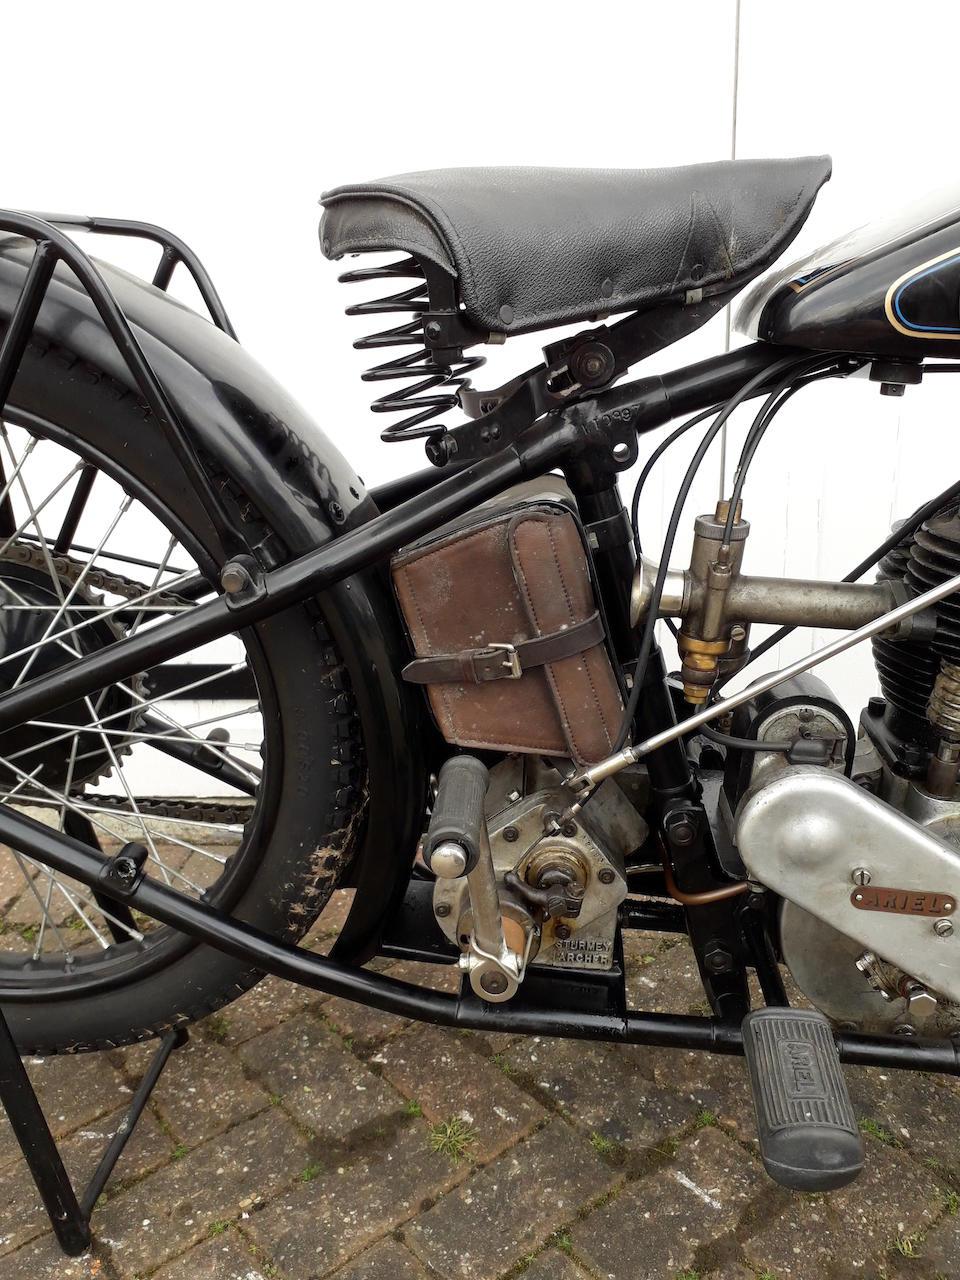 1928 Ariel 557cc Model A Project Frame no. W.10997 Engine no. W10260